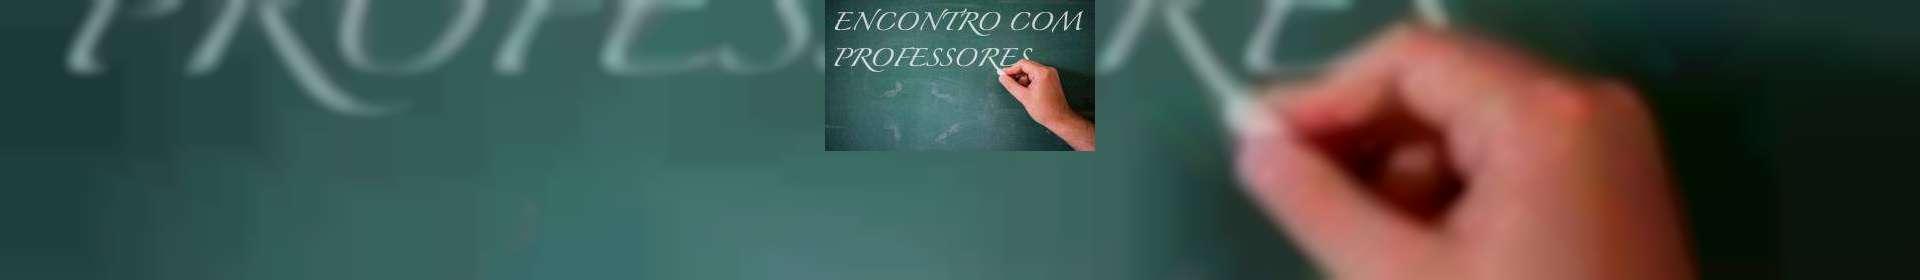 A quinta medida - Encontro com Professores